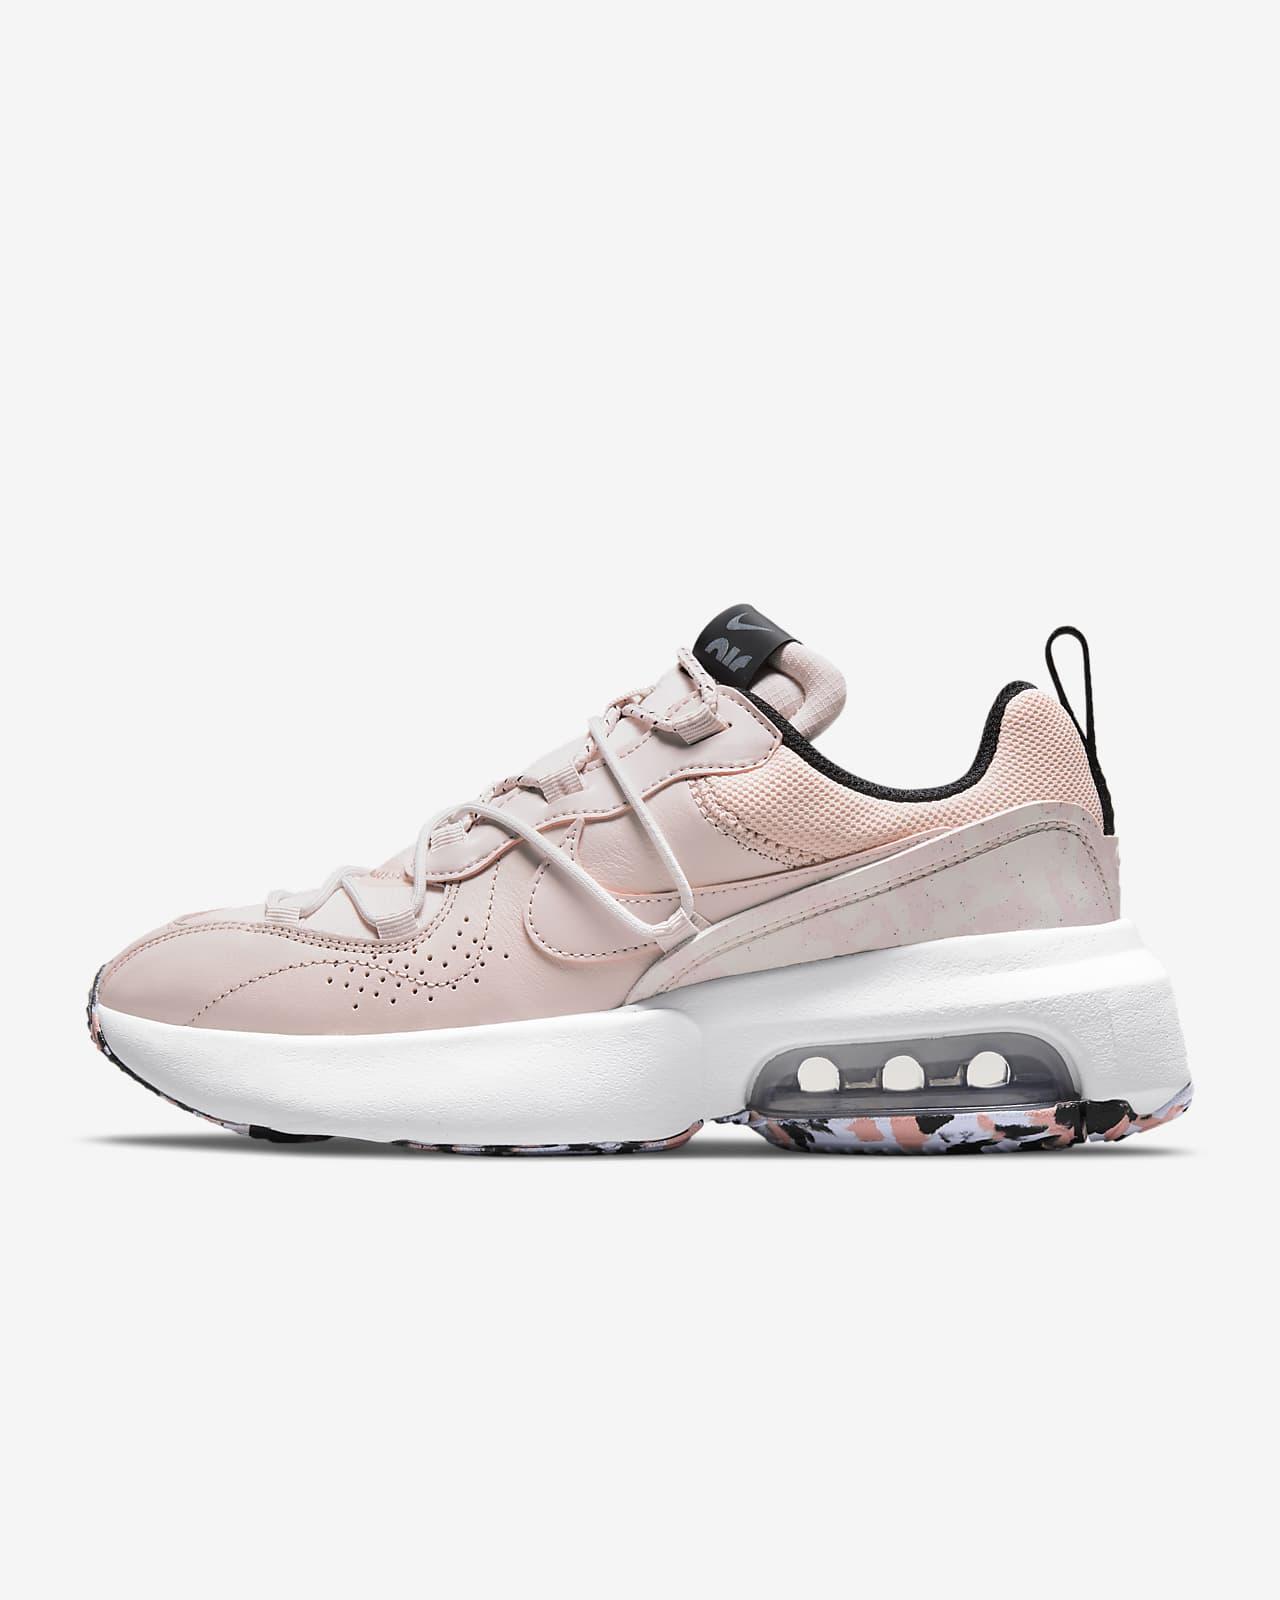 Nike Air Max Viva Women's Shoe